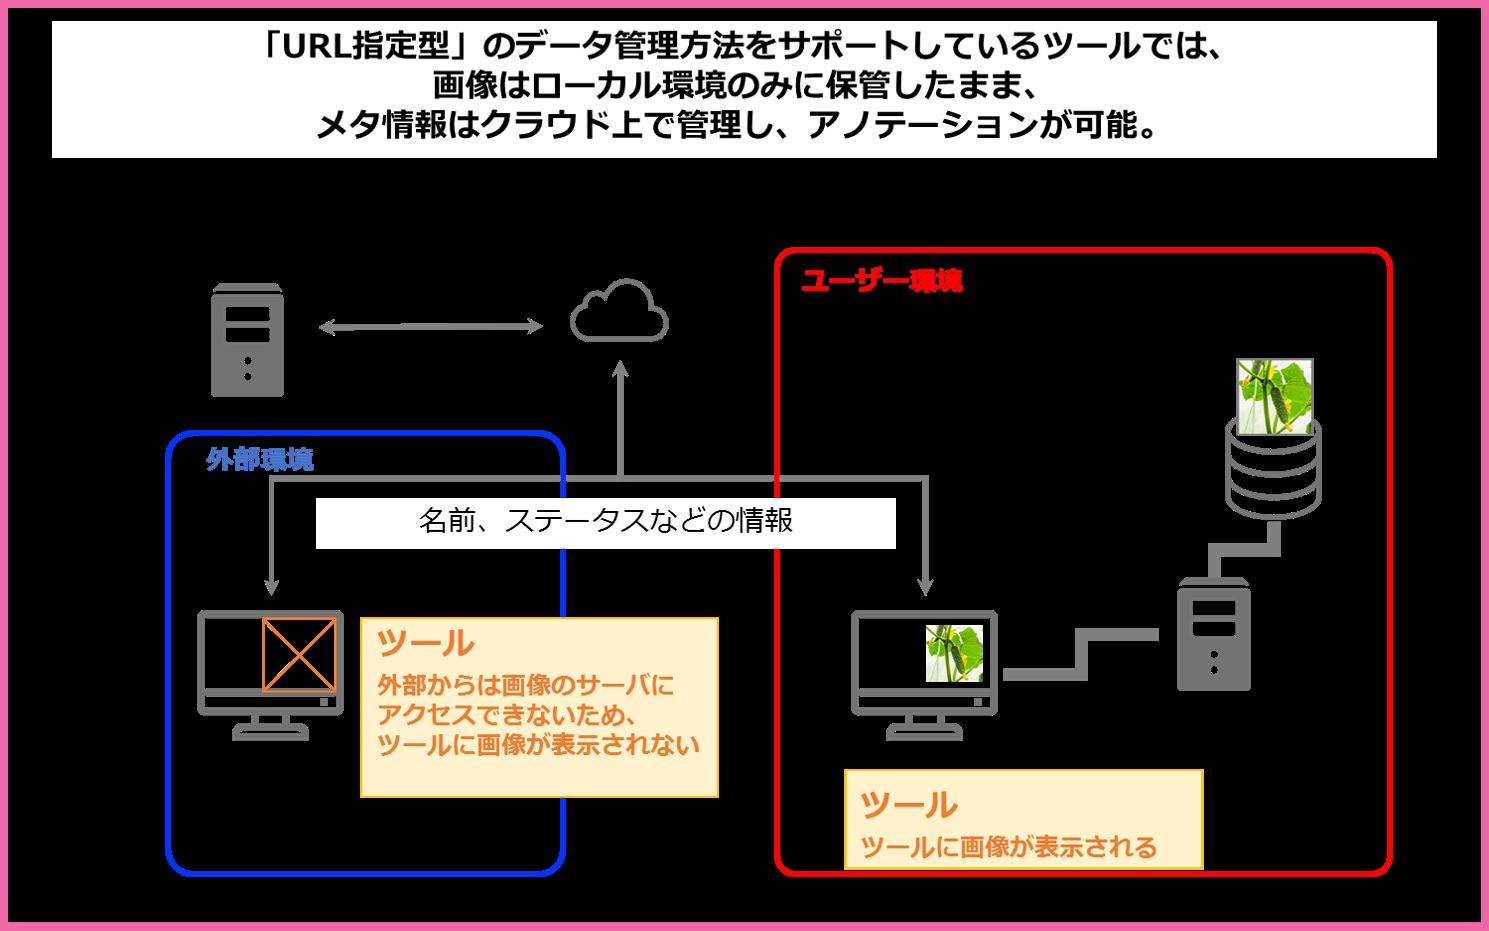 URL指定型ツールのアノテーション